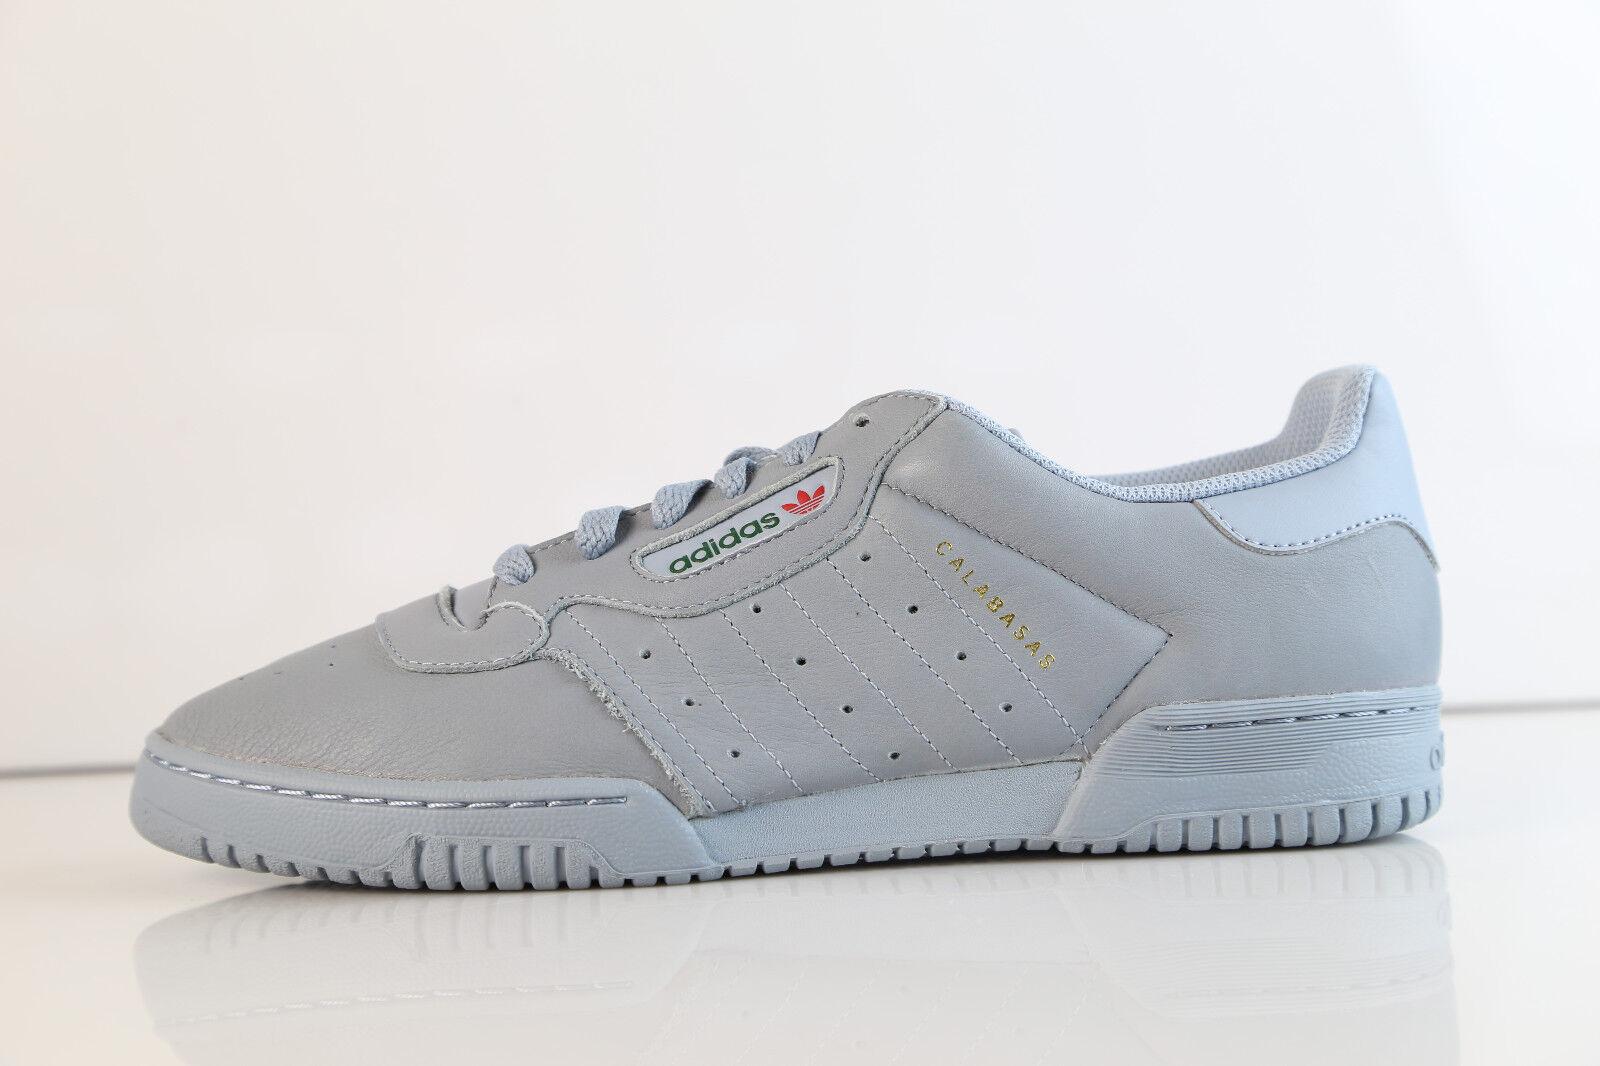 Adidas X Yeezy PowerPhase Calabasas gris 2018 CG6422 8-14 9 10 Kanye West